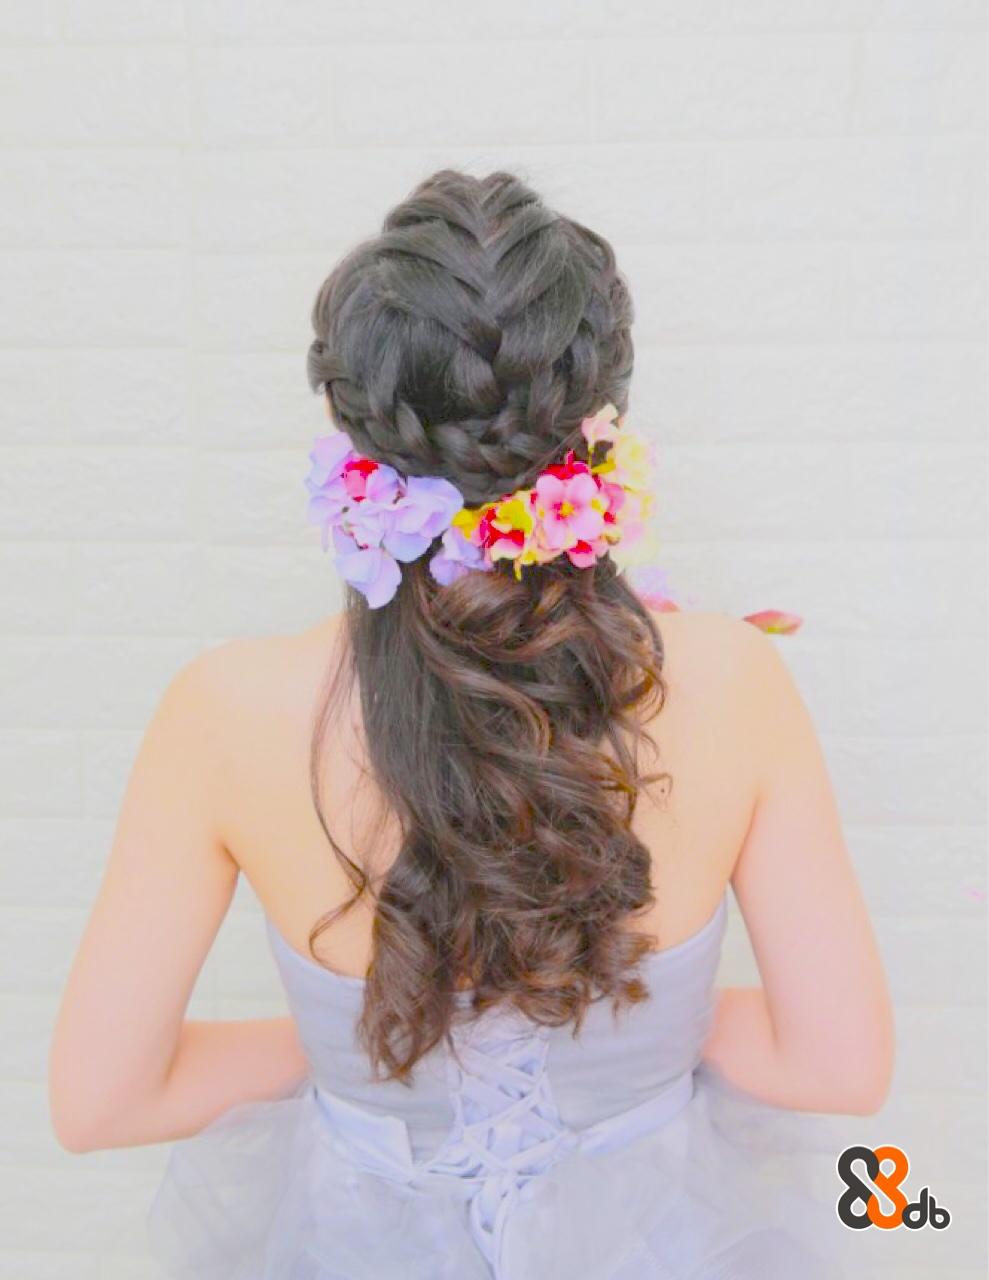 hair,hairstyle,hair accessory,headpiece,flower